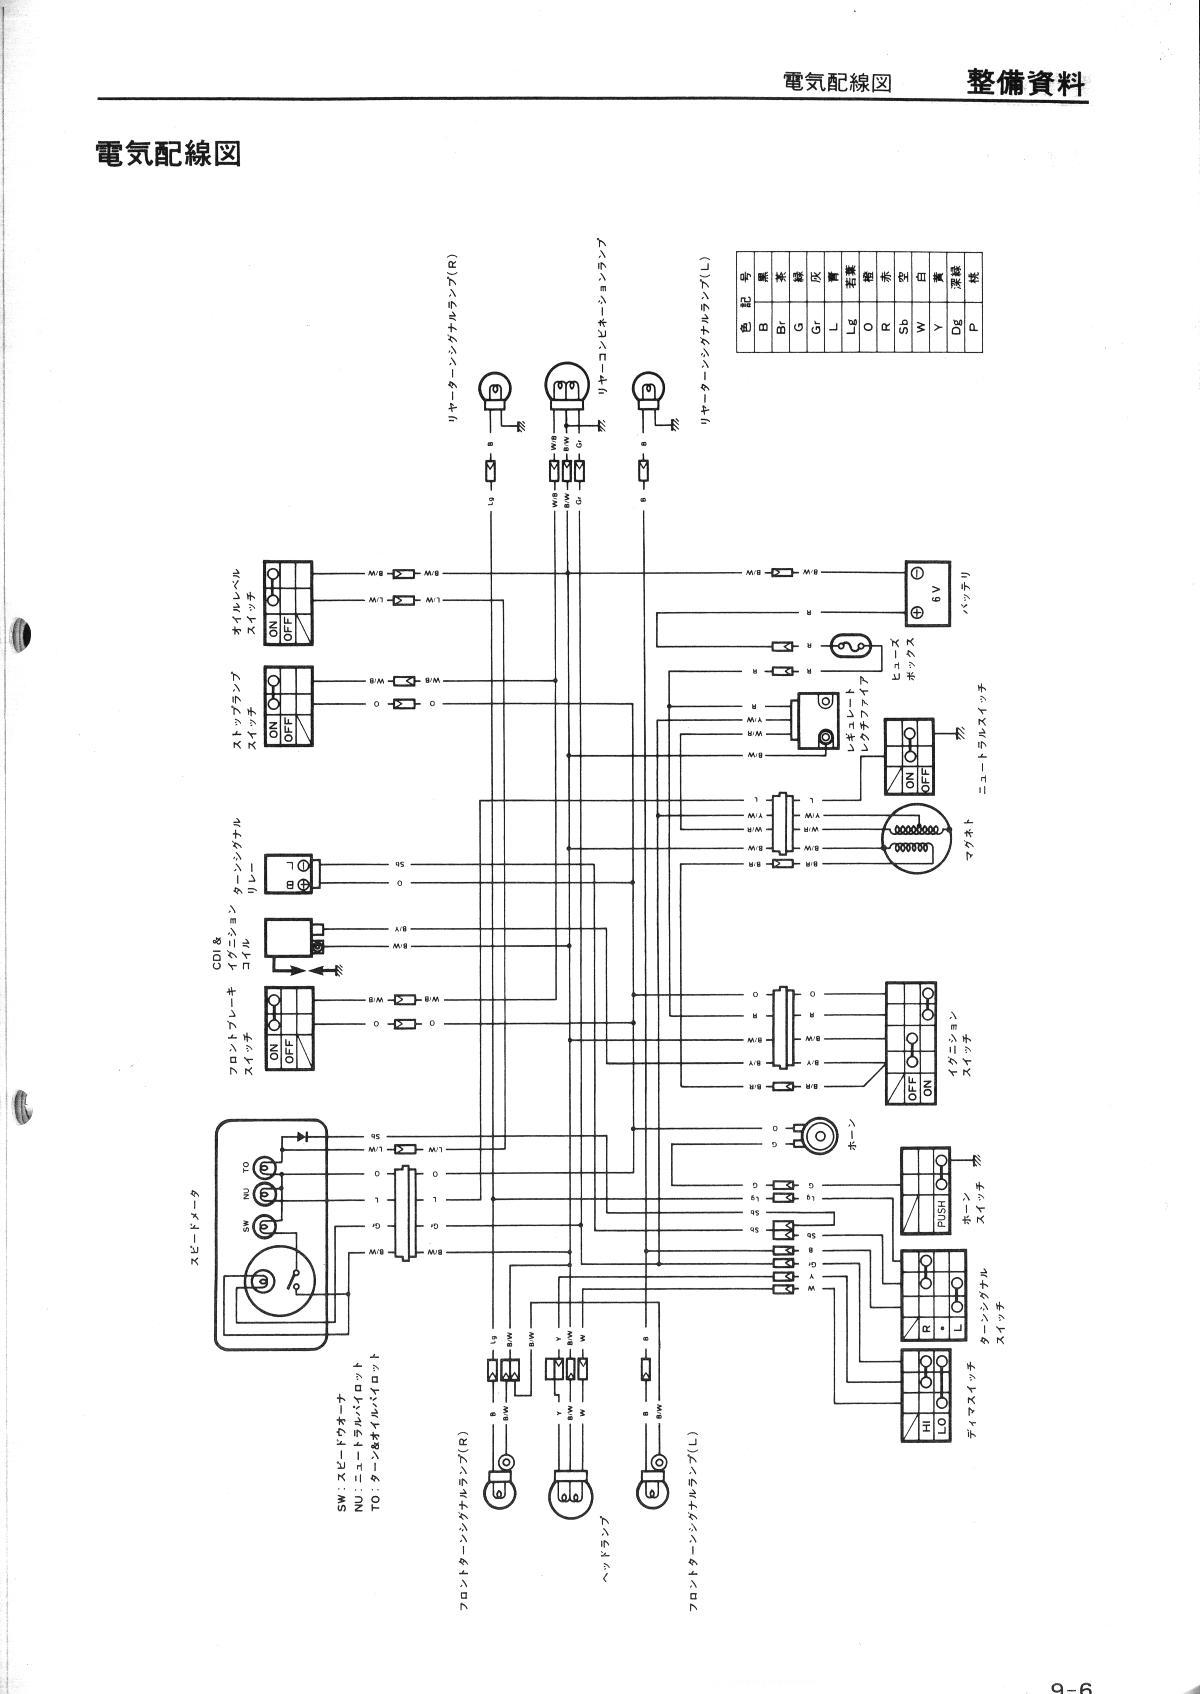 suzuki epo wiring diagram_japanese_new square d shunt trip breaker wiring diagram wirdig readingrat net epo wiring diagram at cos-gaming.co